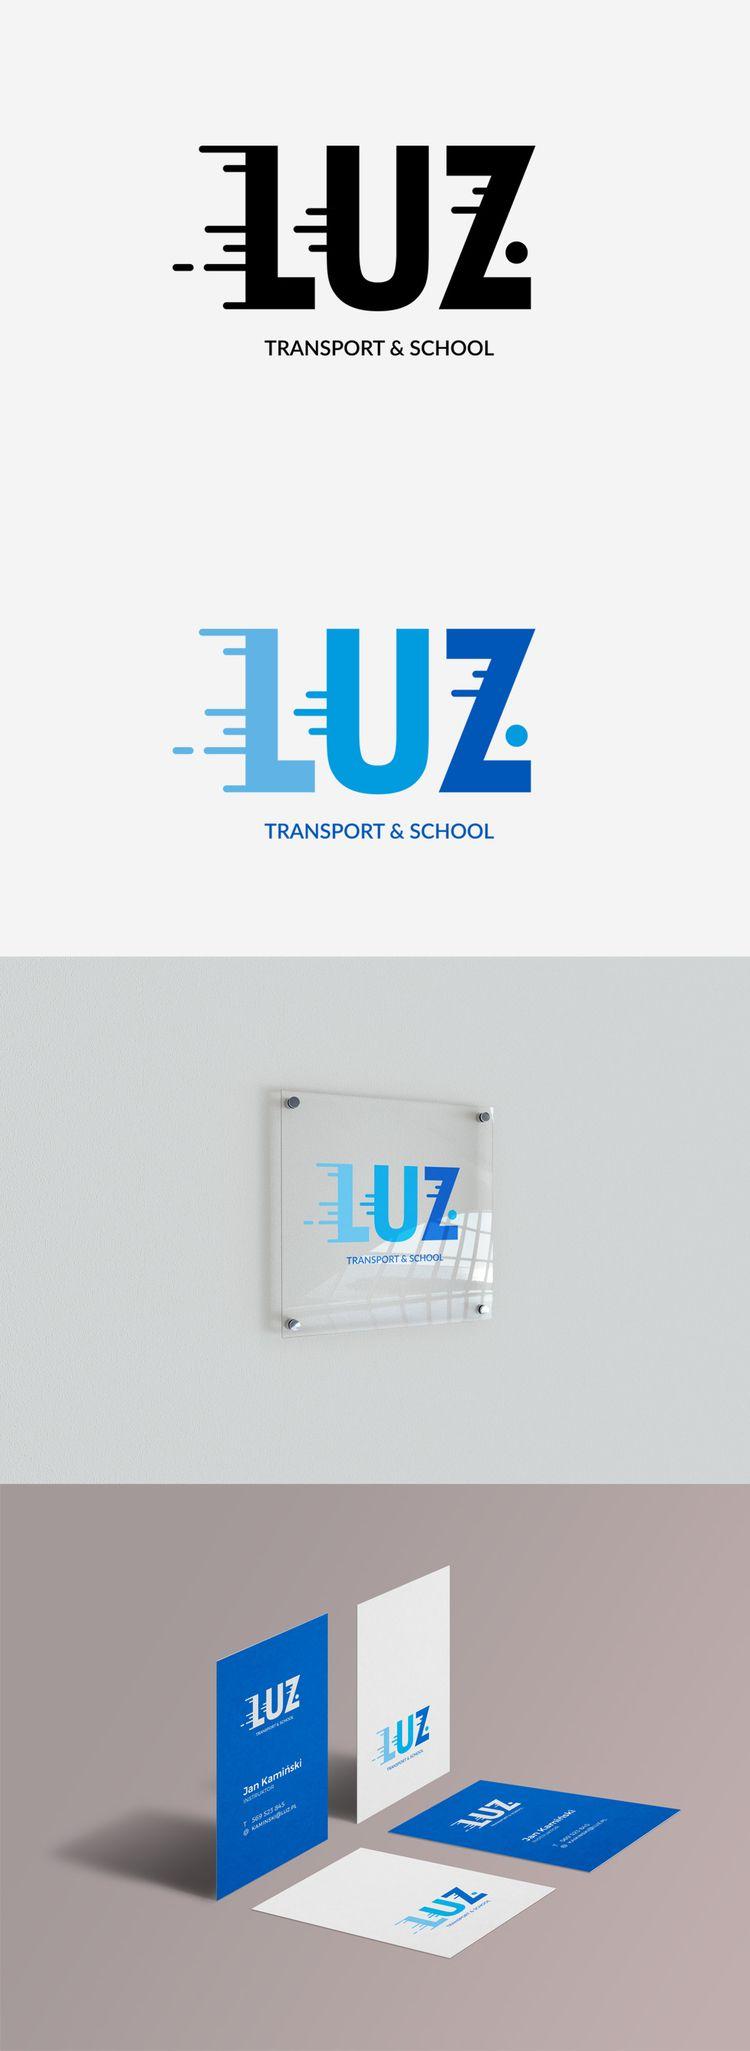 Driving school logo - m_sturgulewska | ello